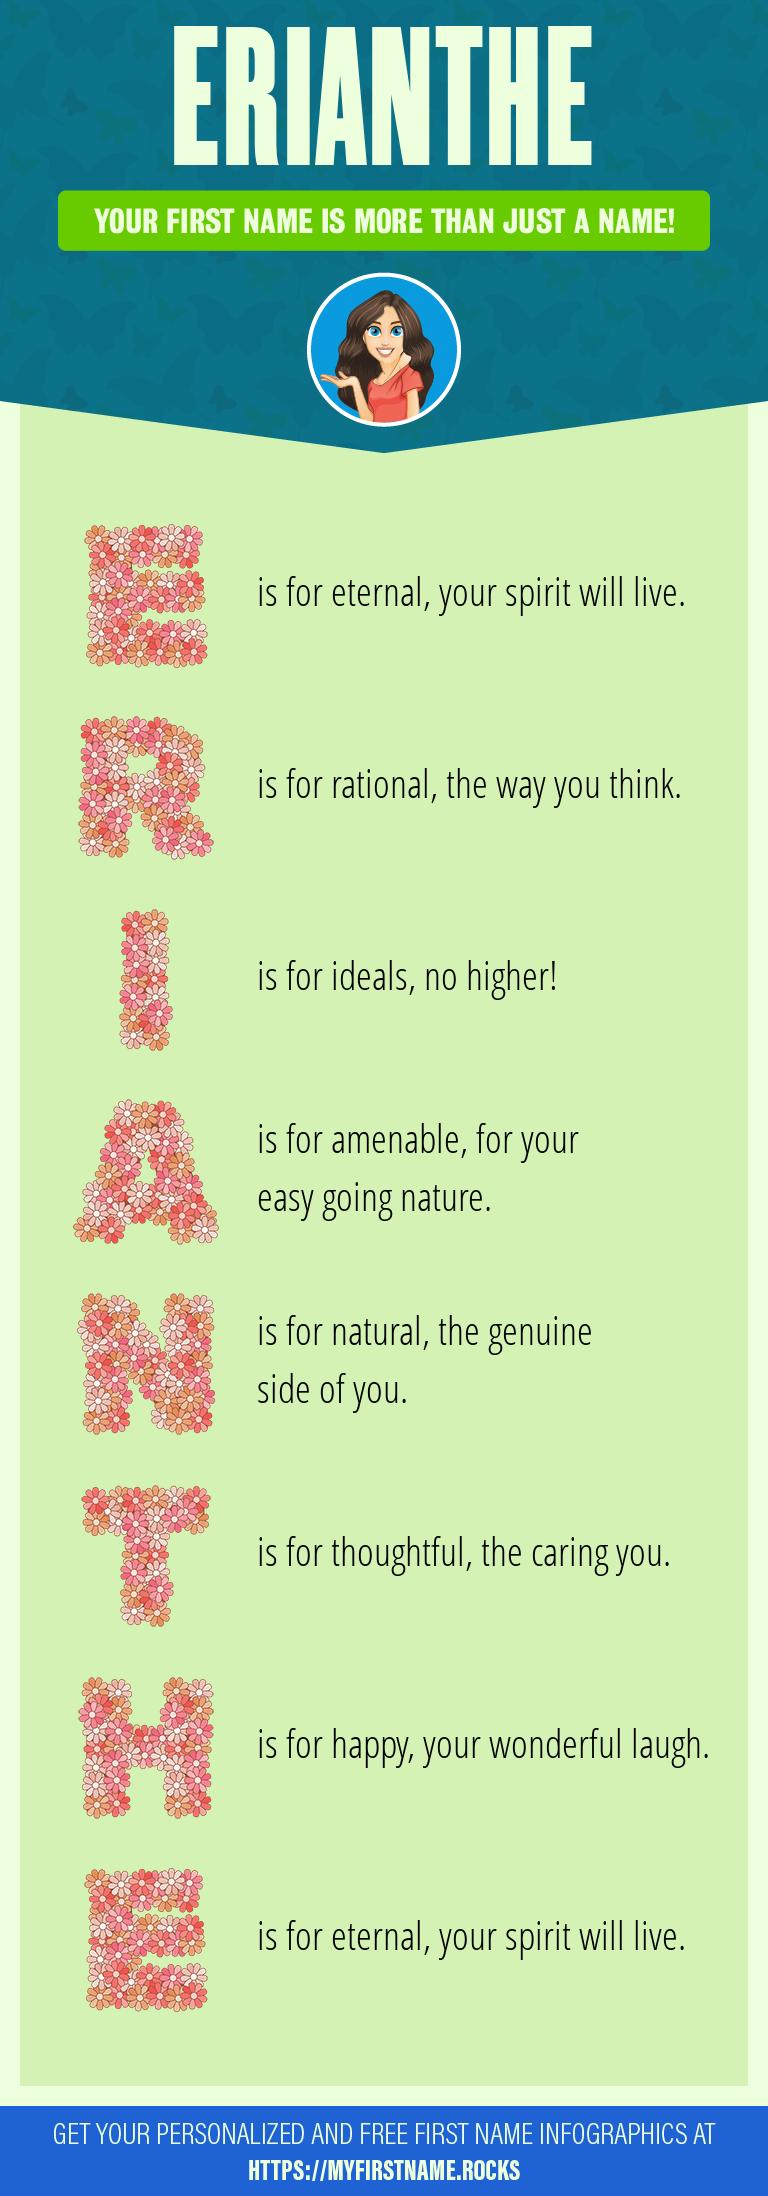 Erianthe Infographics